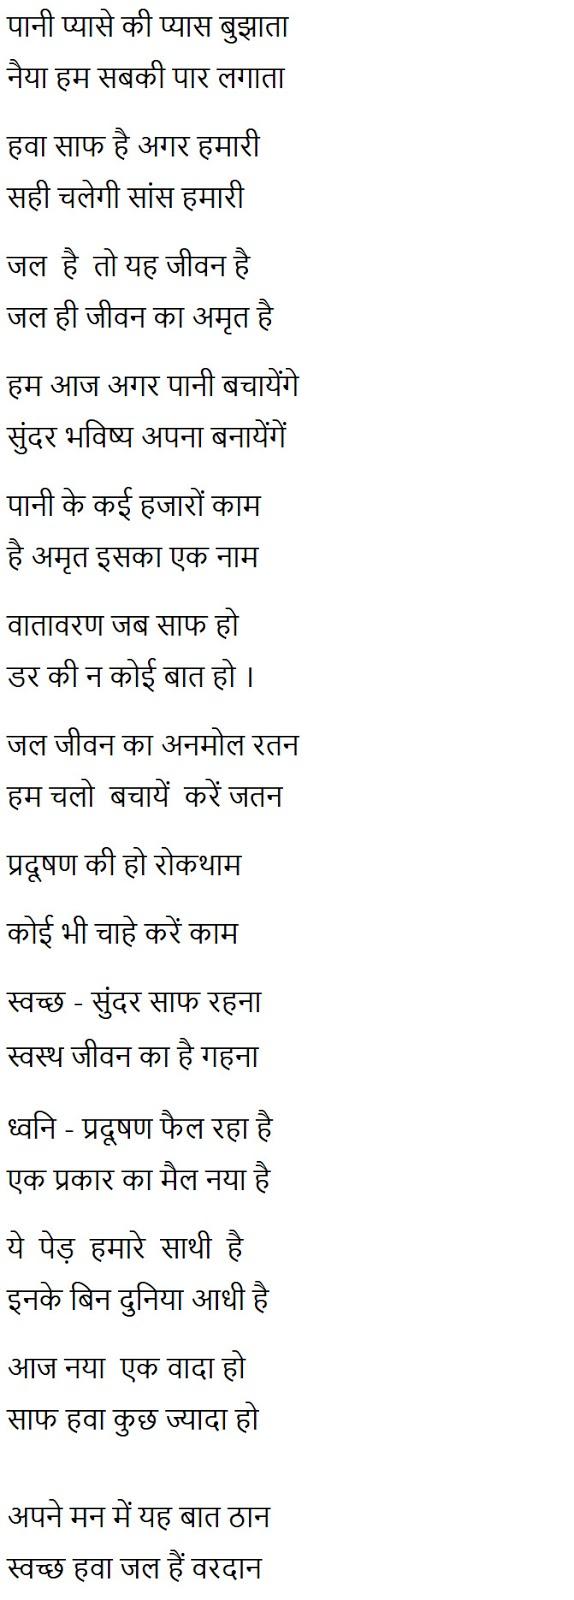 Original Slogans On Trees In Hindi - Soaknowledge